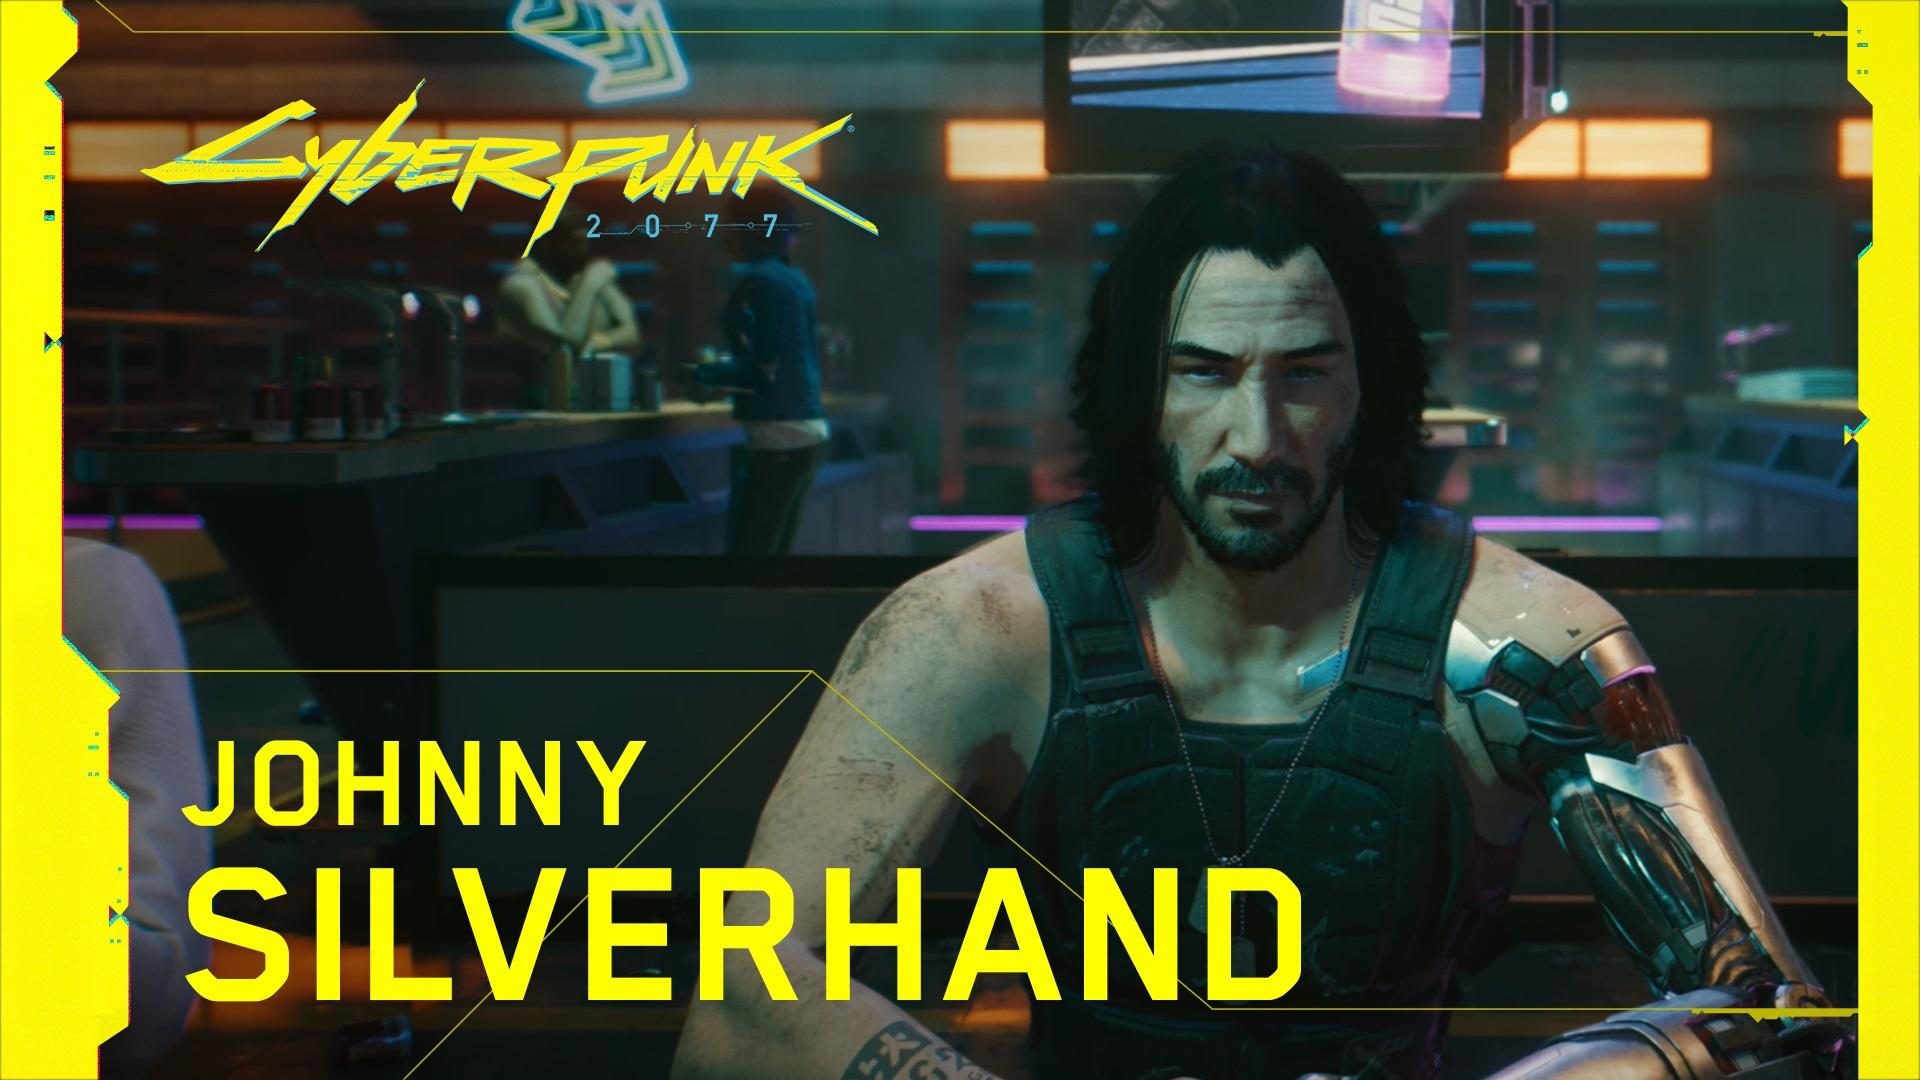 Novo episódio do Night City Wire destaca Johnny Silverhand, gameplay e featurettes de Cyberpunk 2077